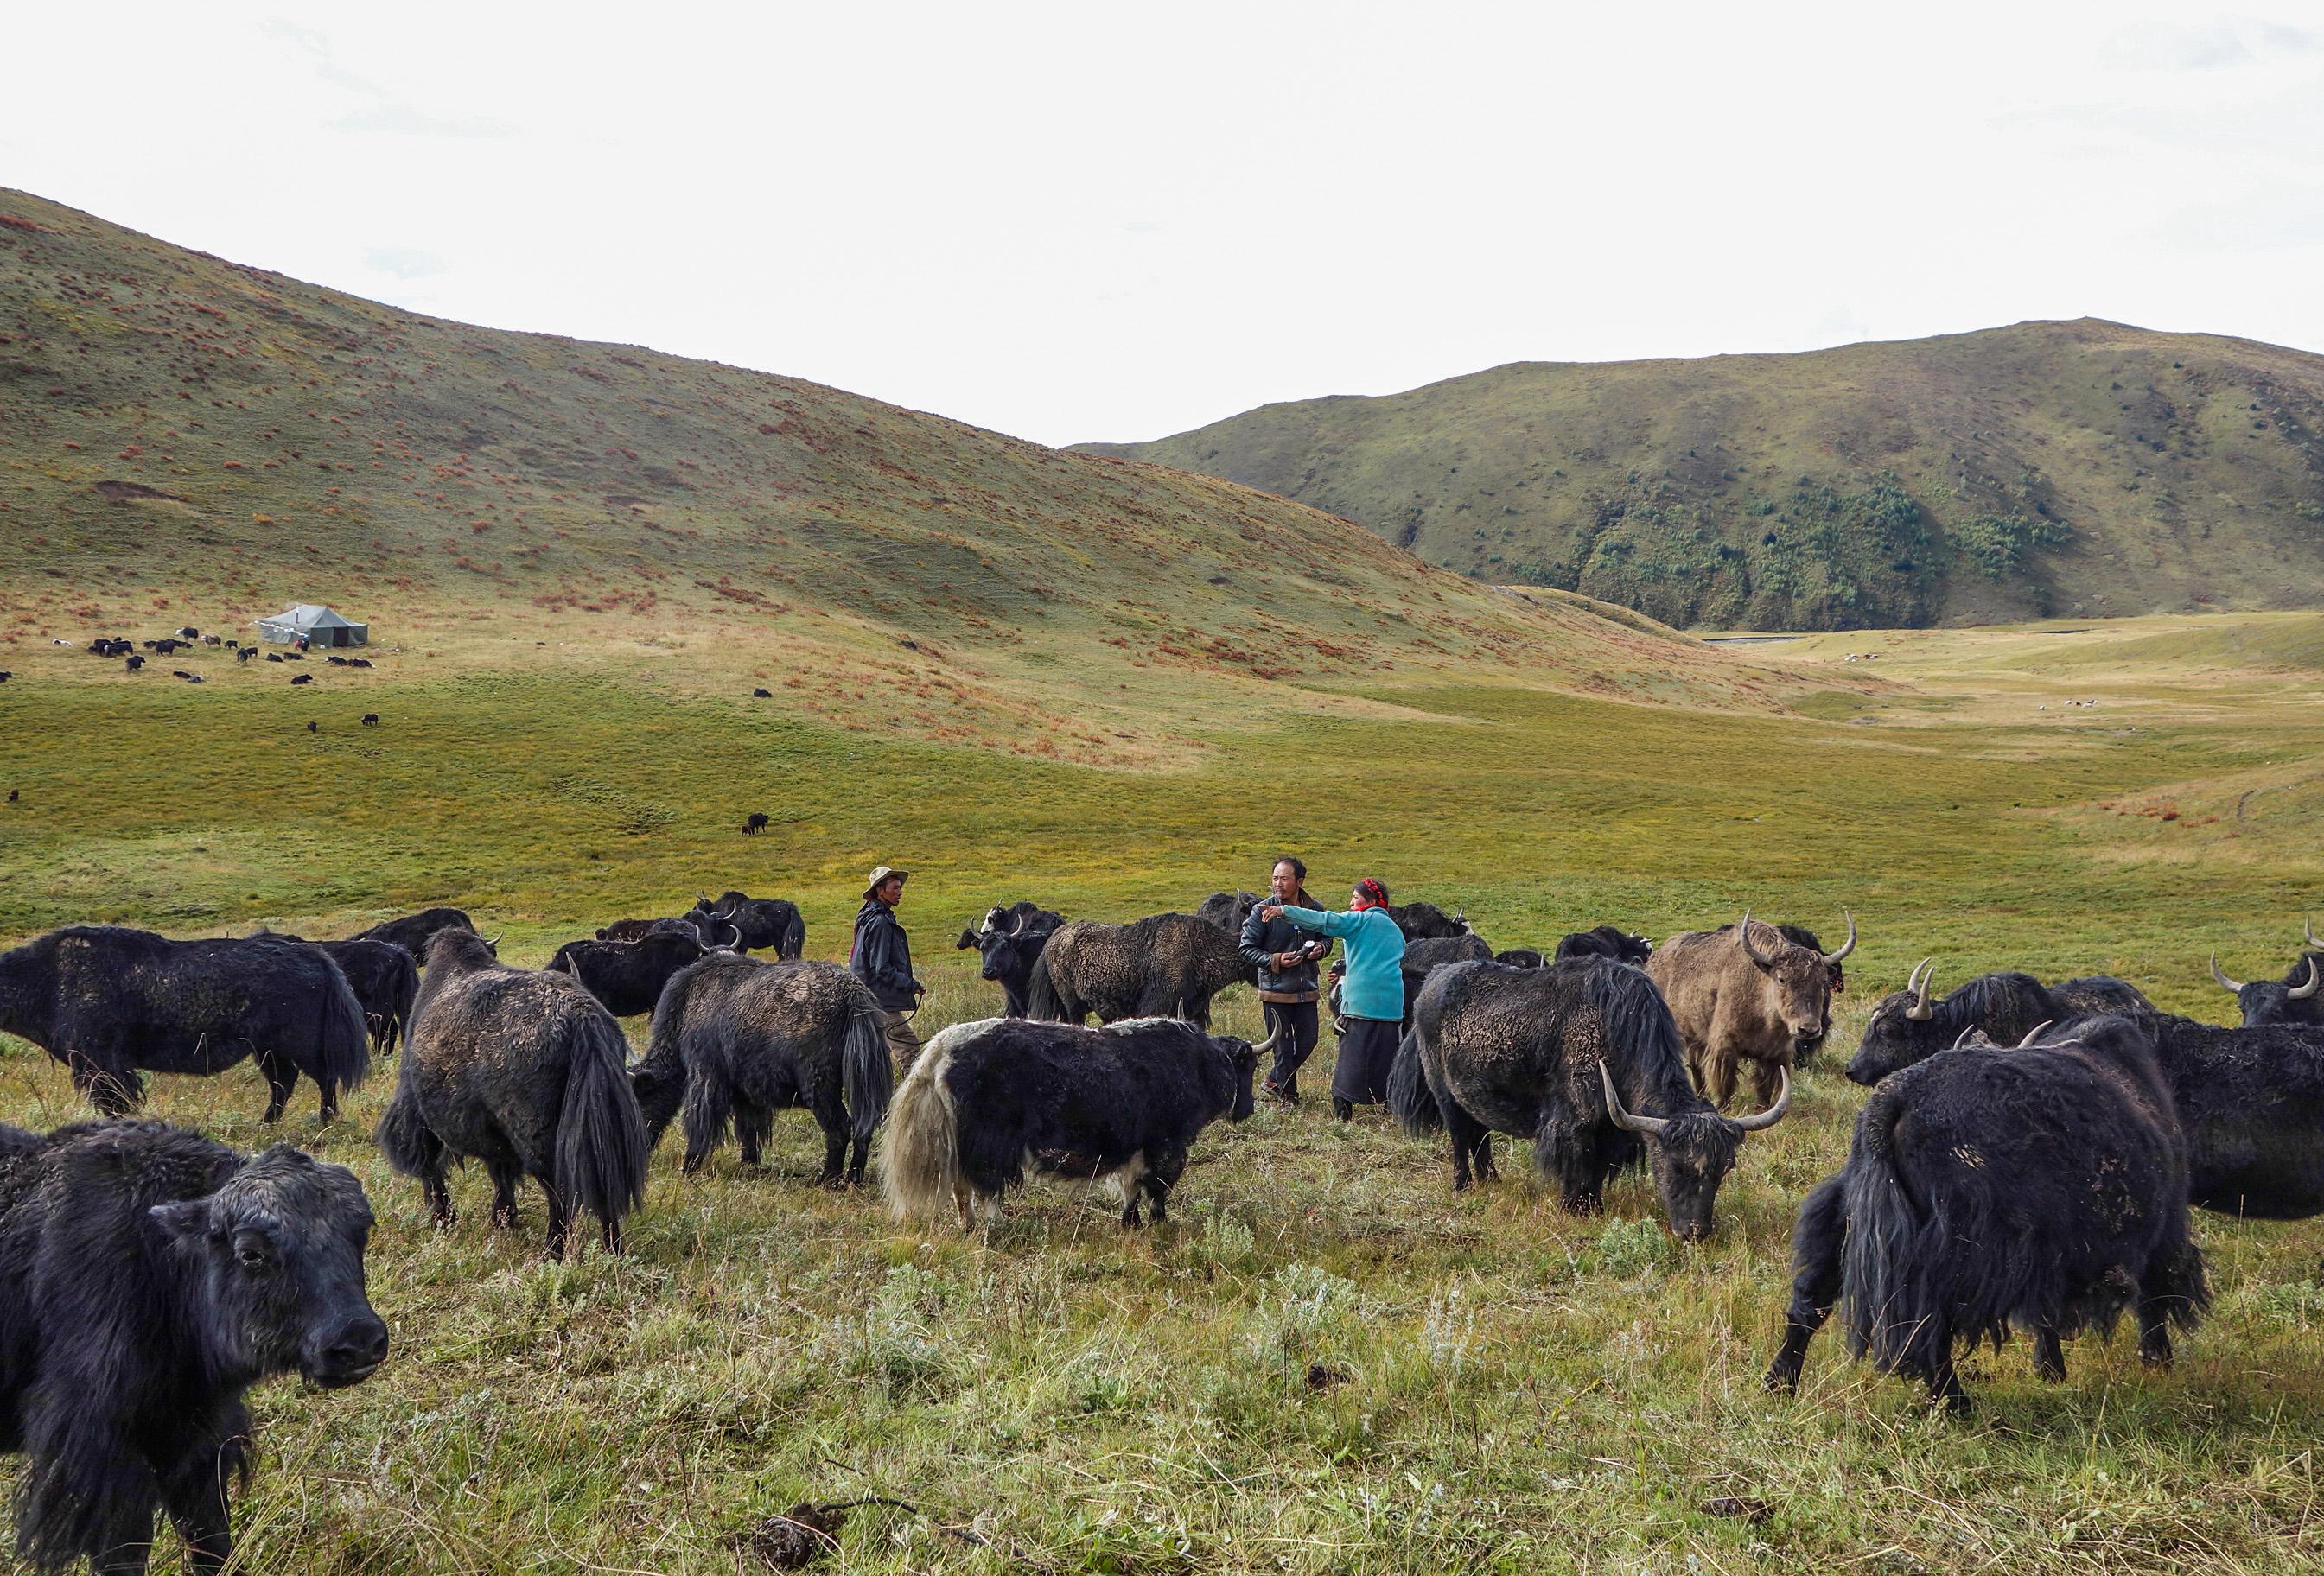 Famille nomade en Chine Tibétaine